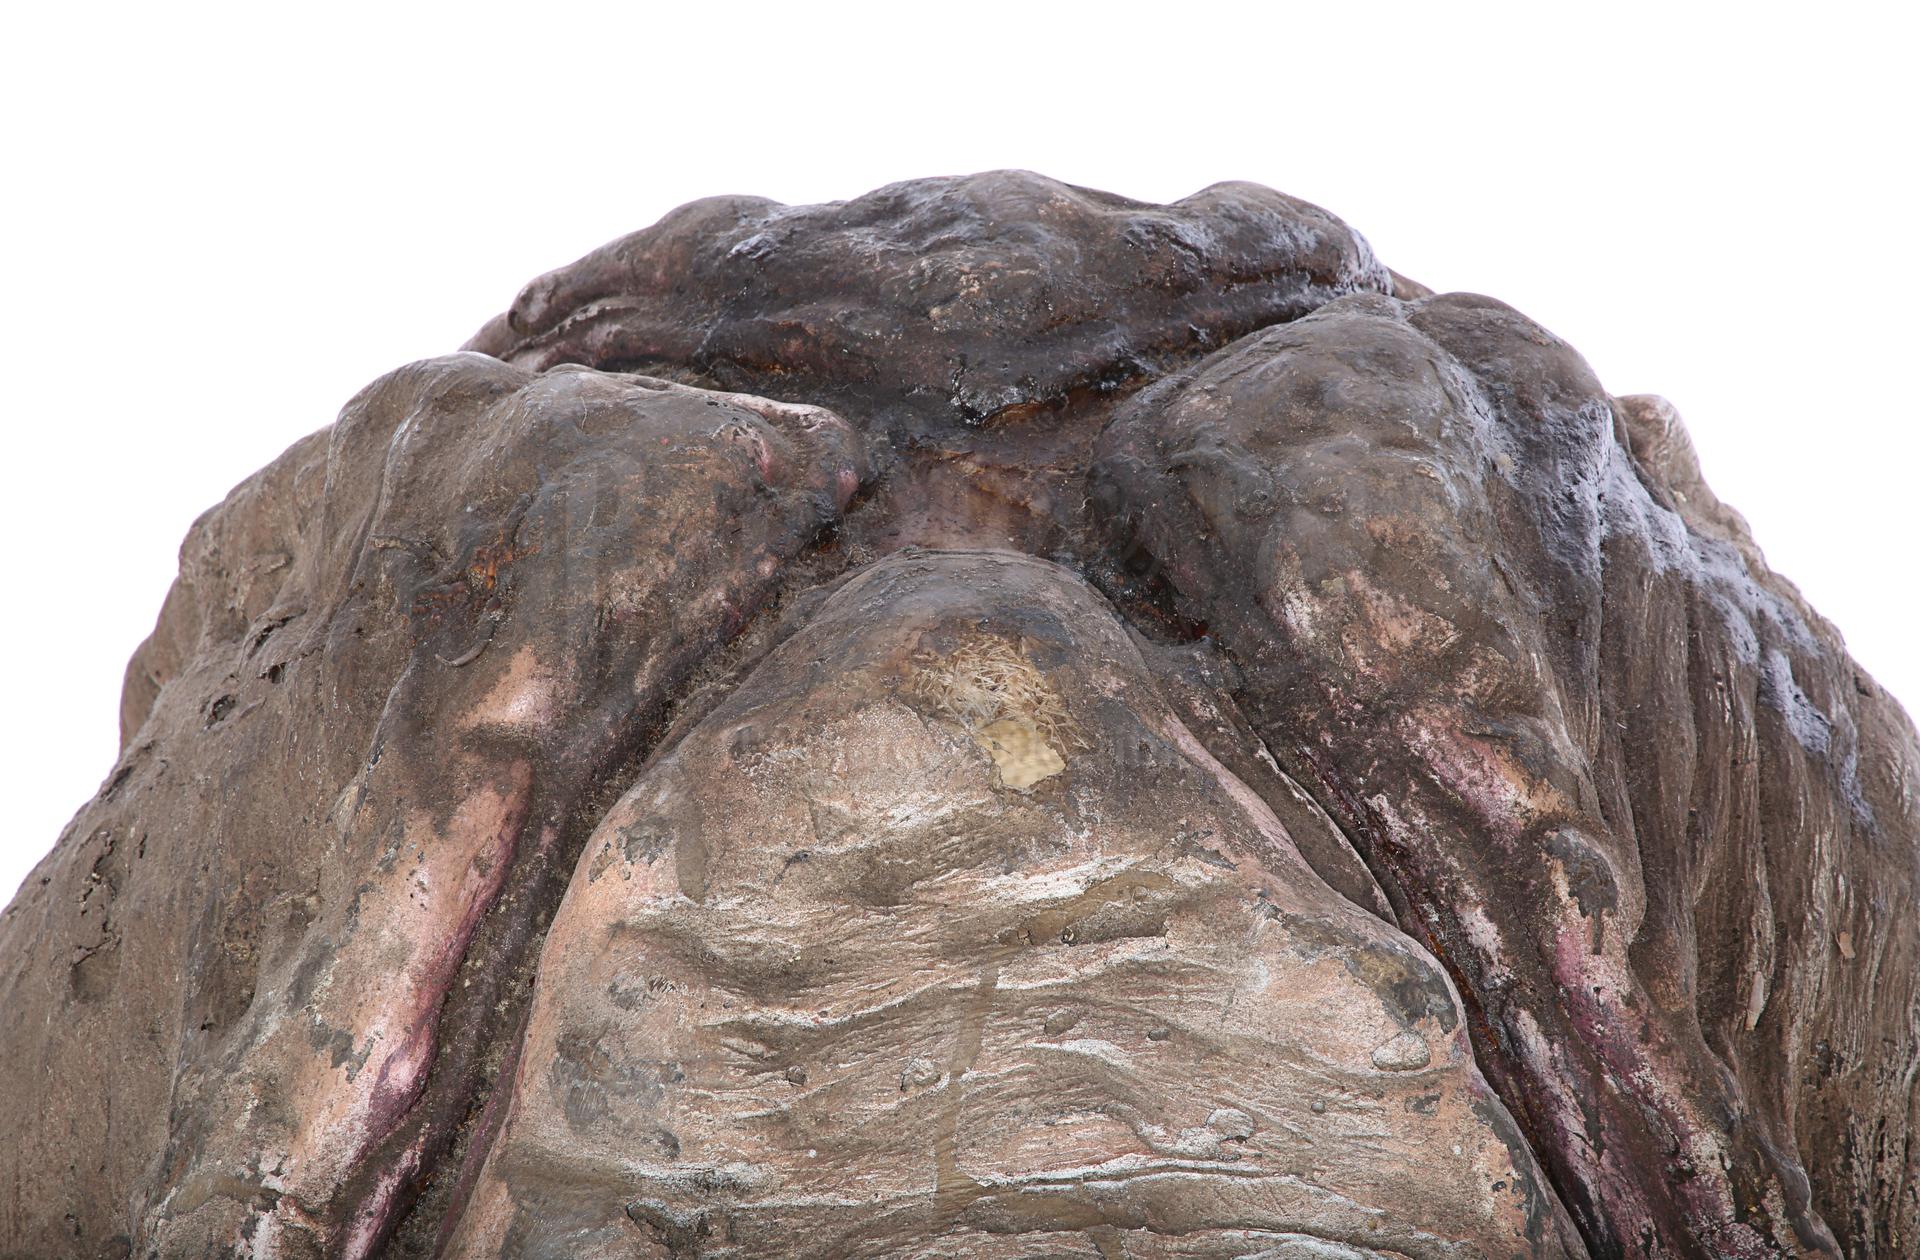 ALIENS (1986) - Xenomorph Egg - Image 3 of 14